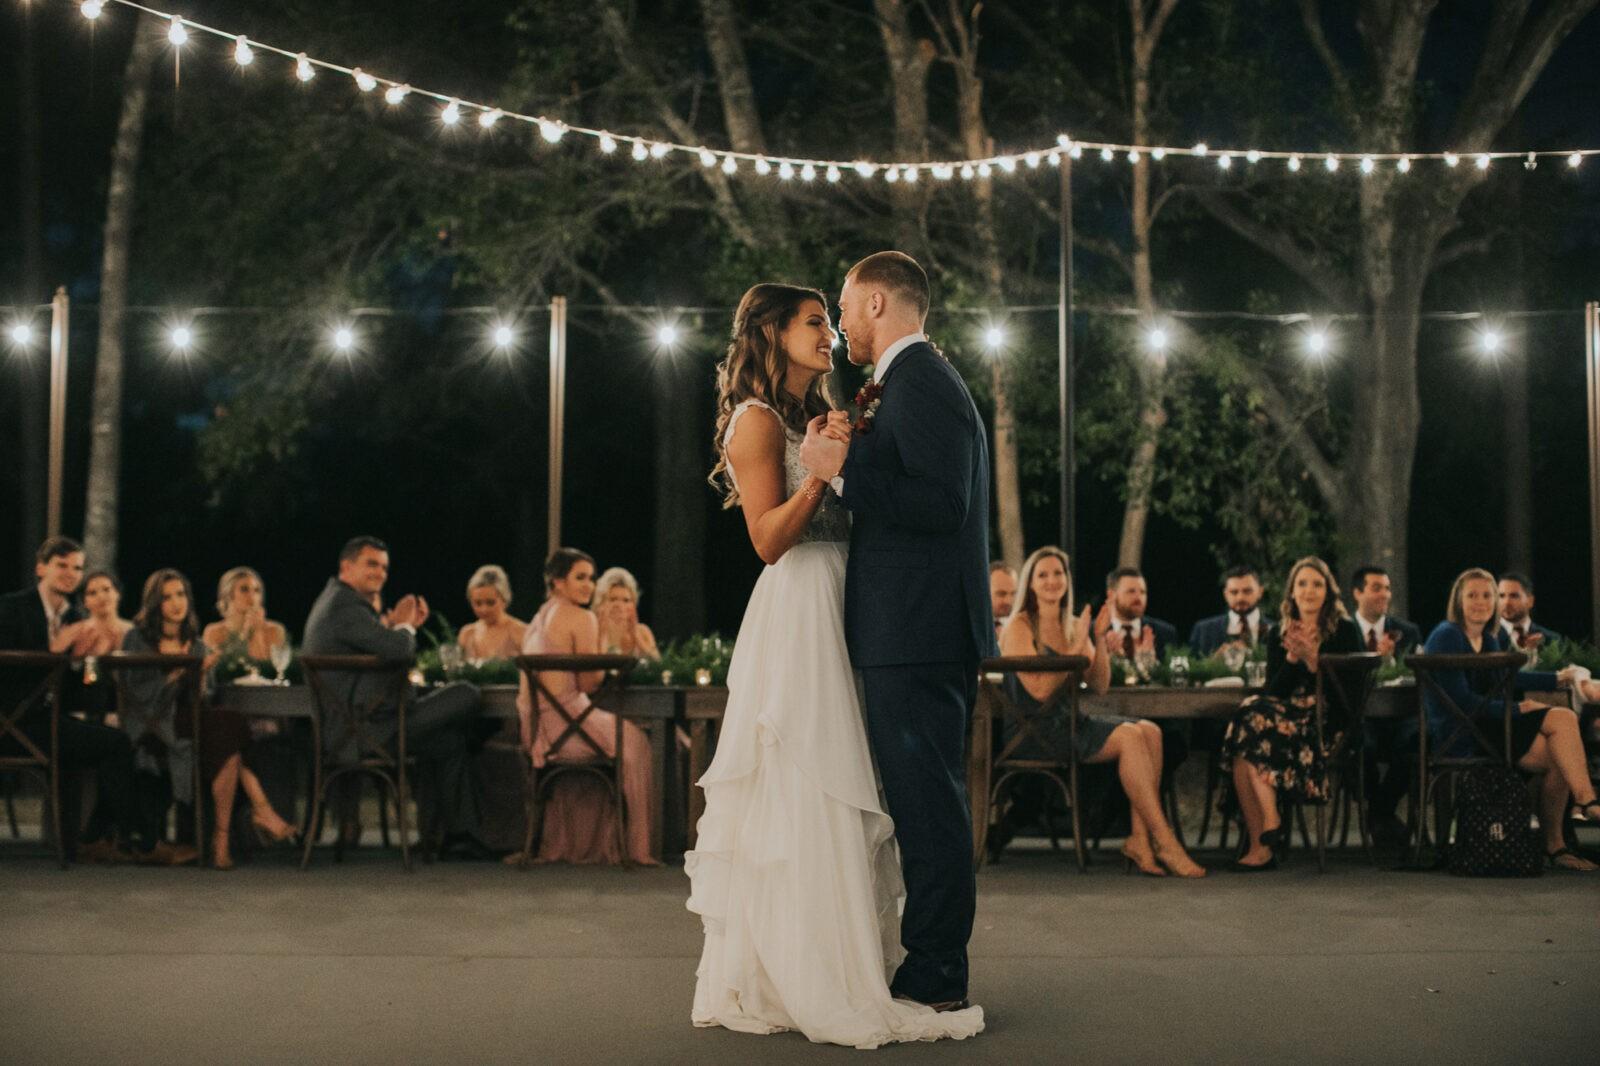 romantic wedding first dance